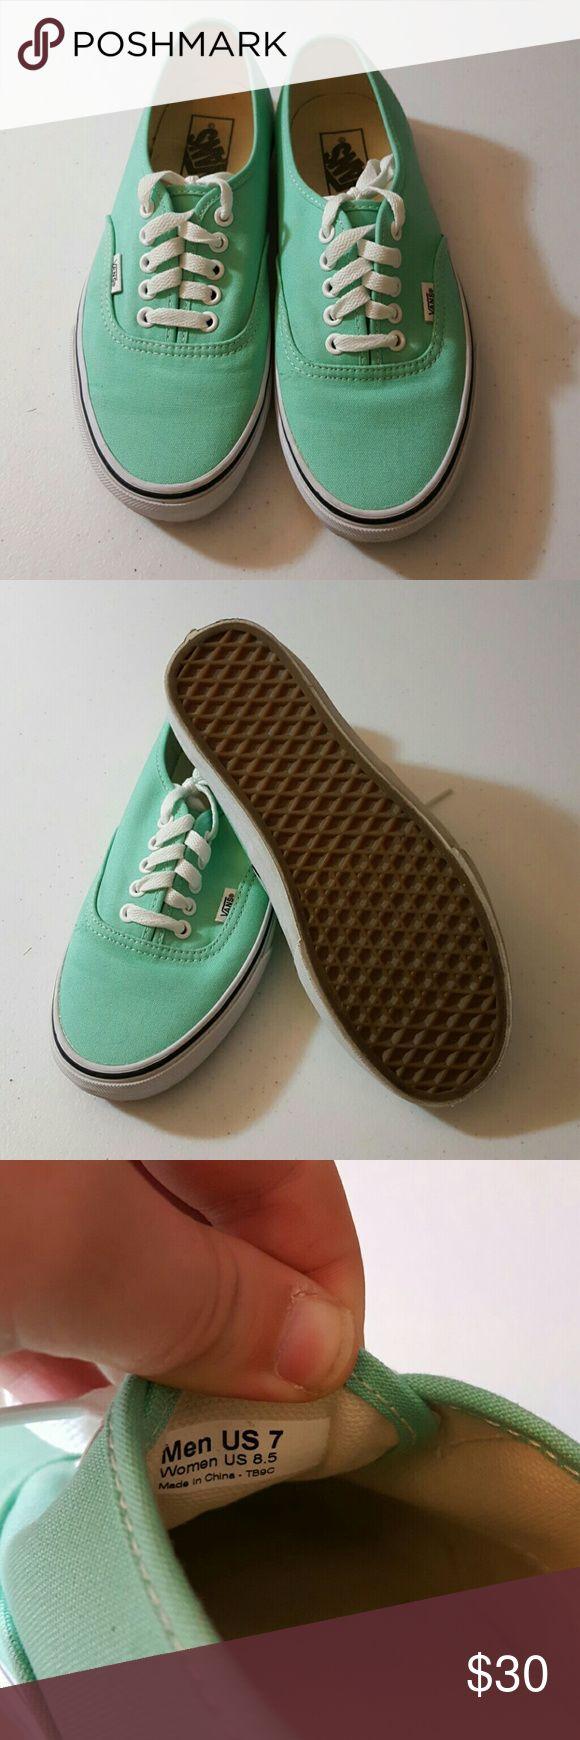 Turquoise vans authentic Turquoise vans authentic shoes. Size 8.5. Light wear. Vans Shoes Sneakers